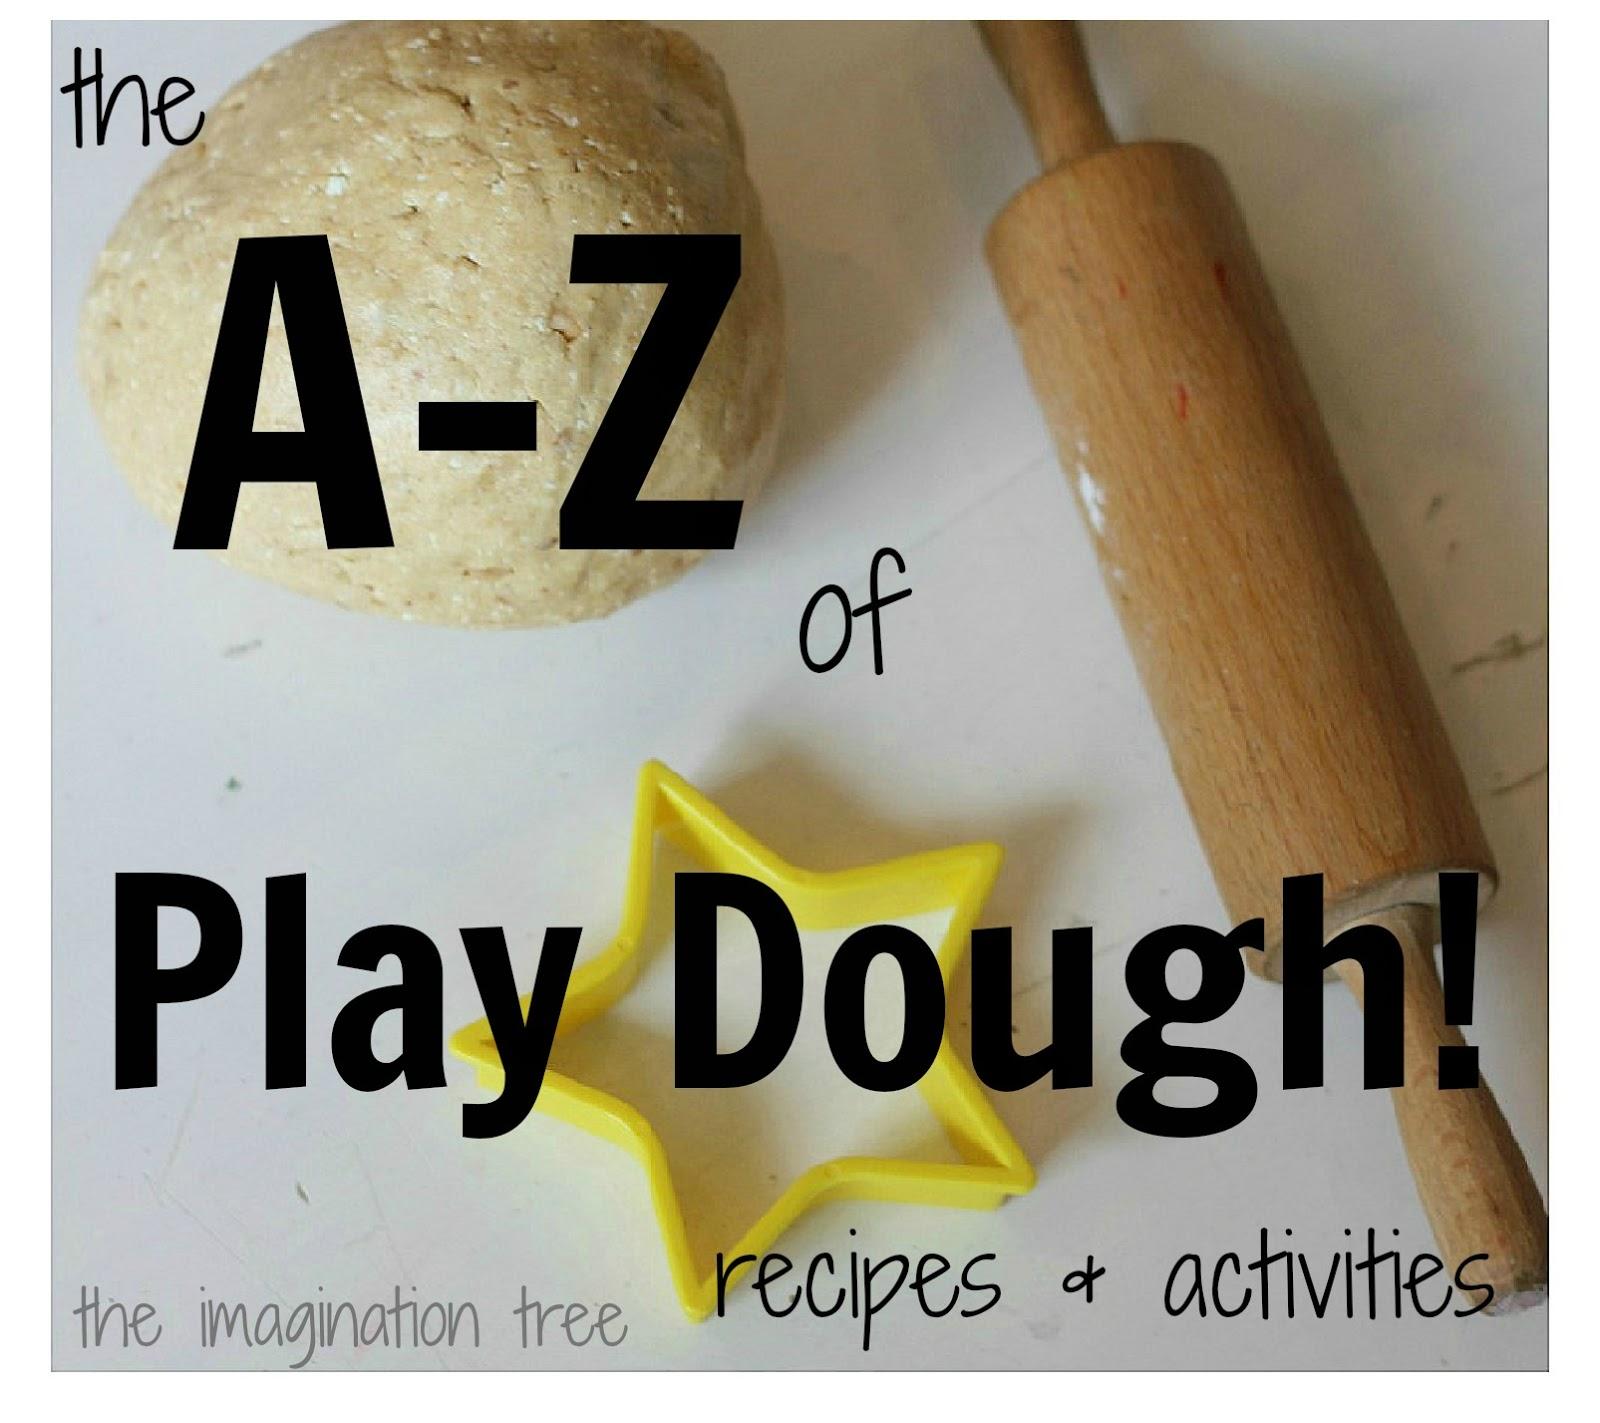 Natural Play Dough Recipe The A-z of Play Dough Recipes